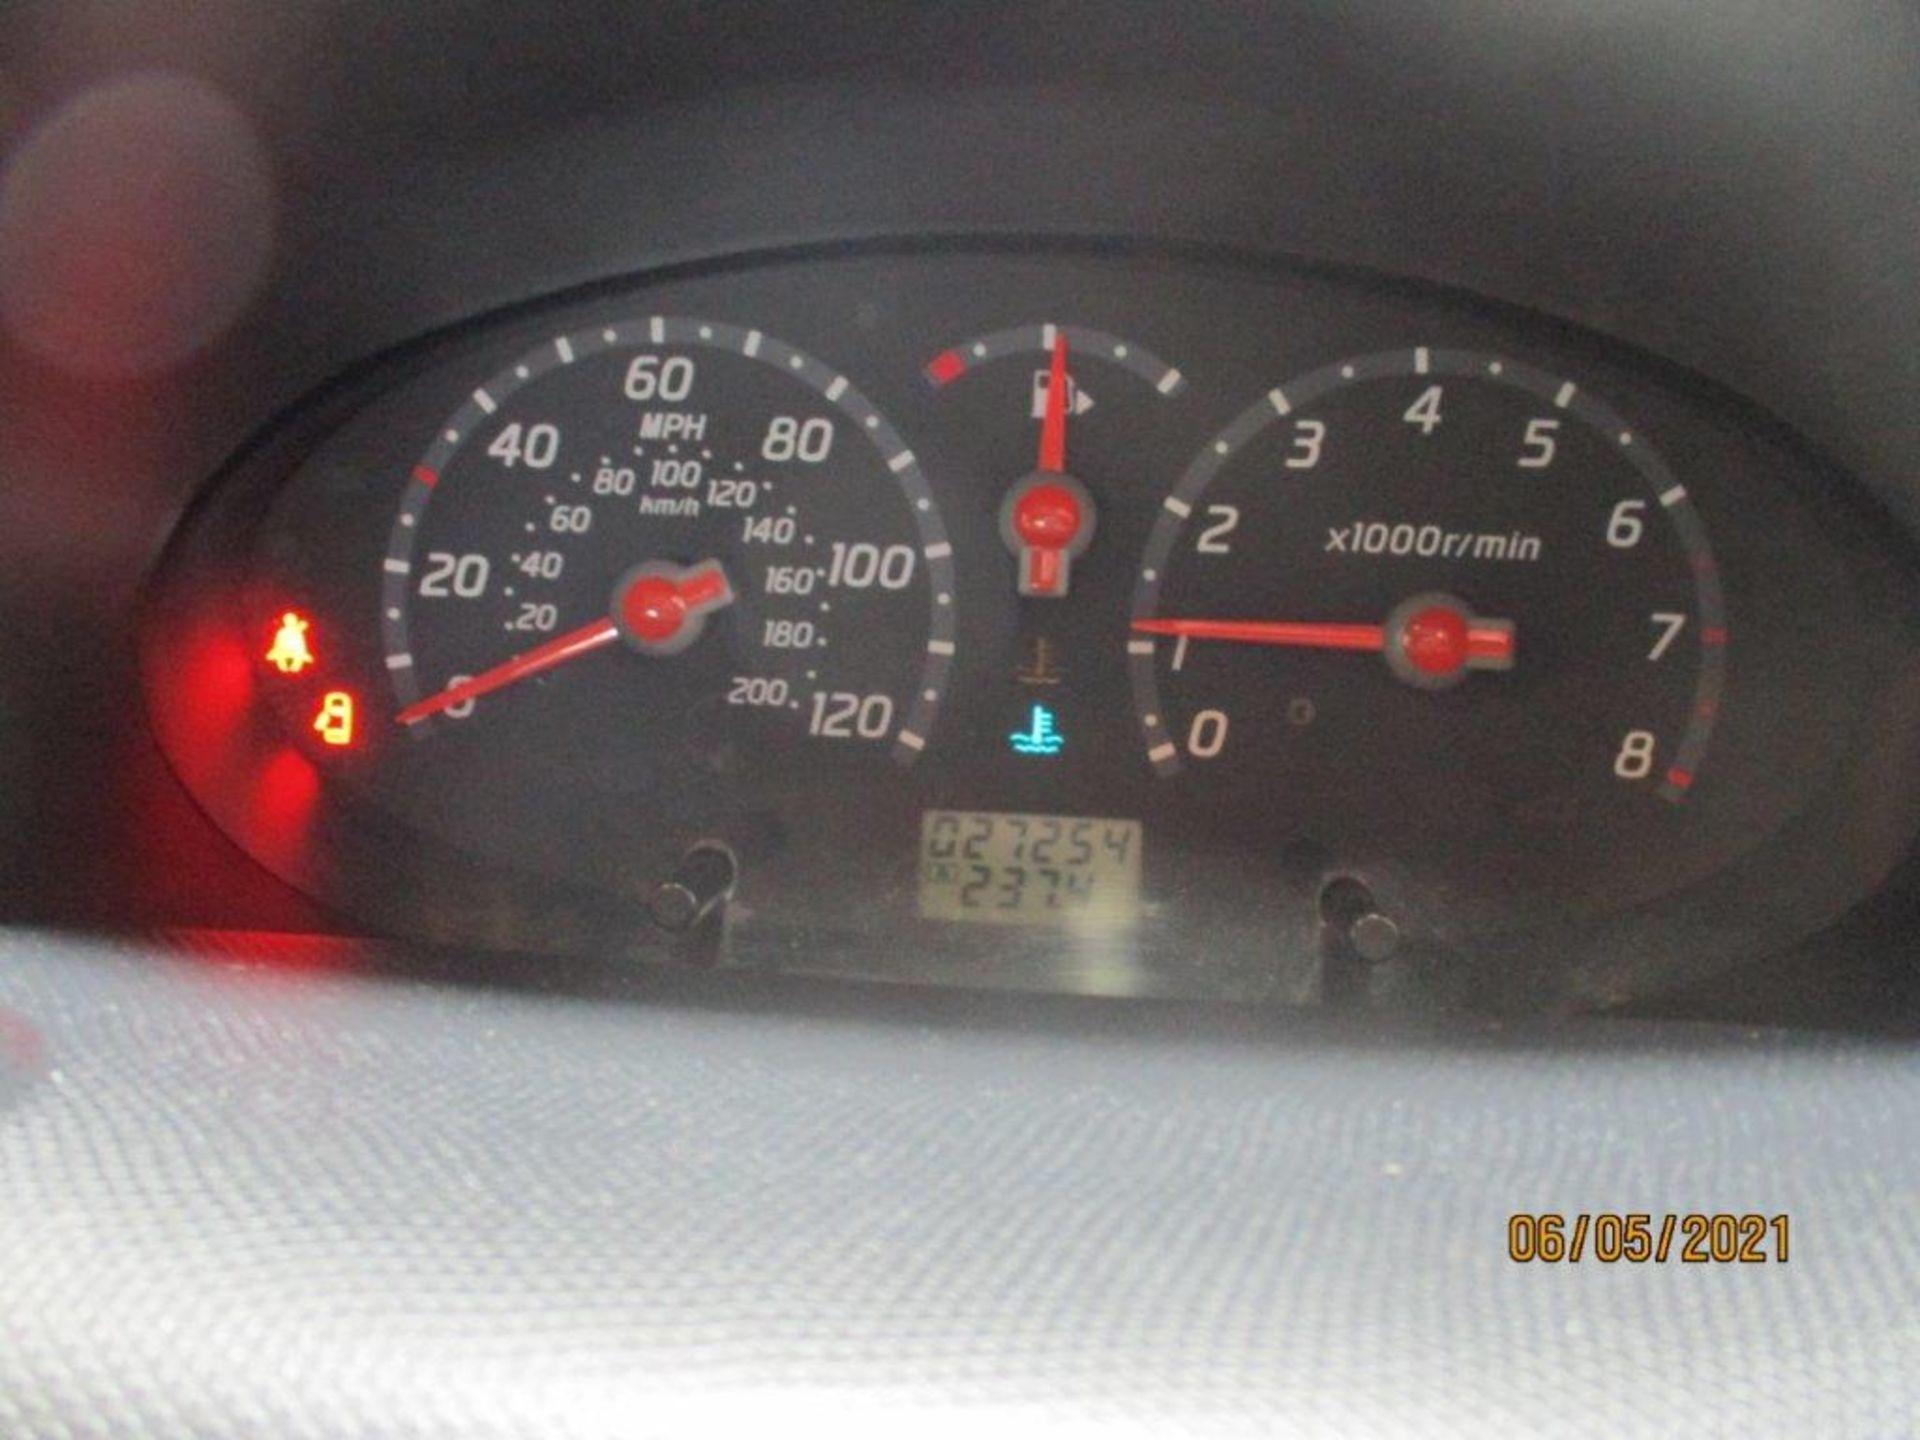 05 05 Nissan Micra SVE - Image 9 of 14